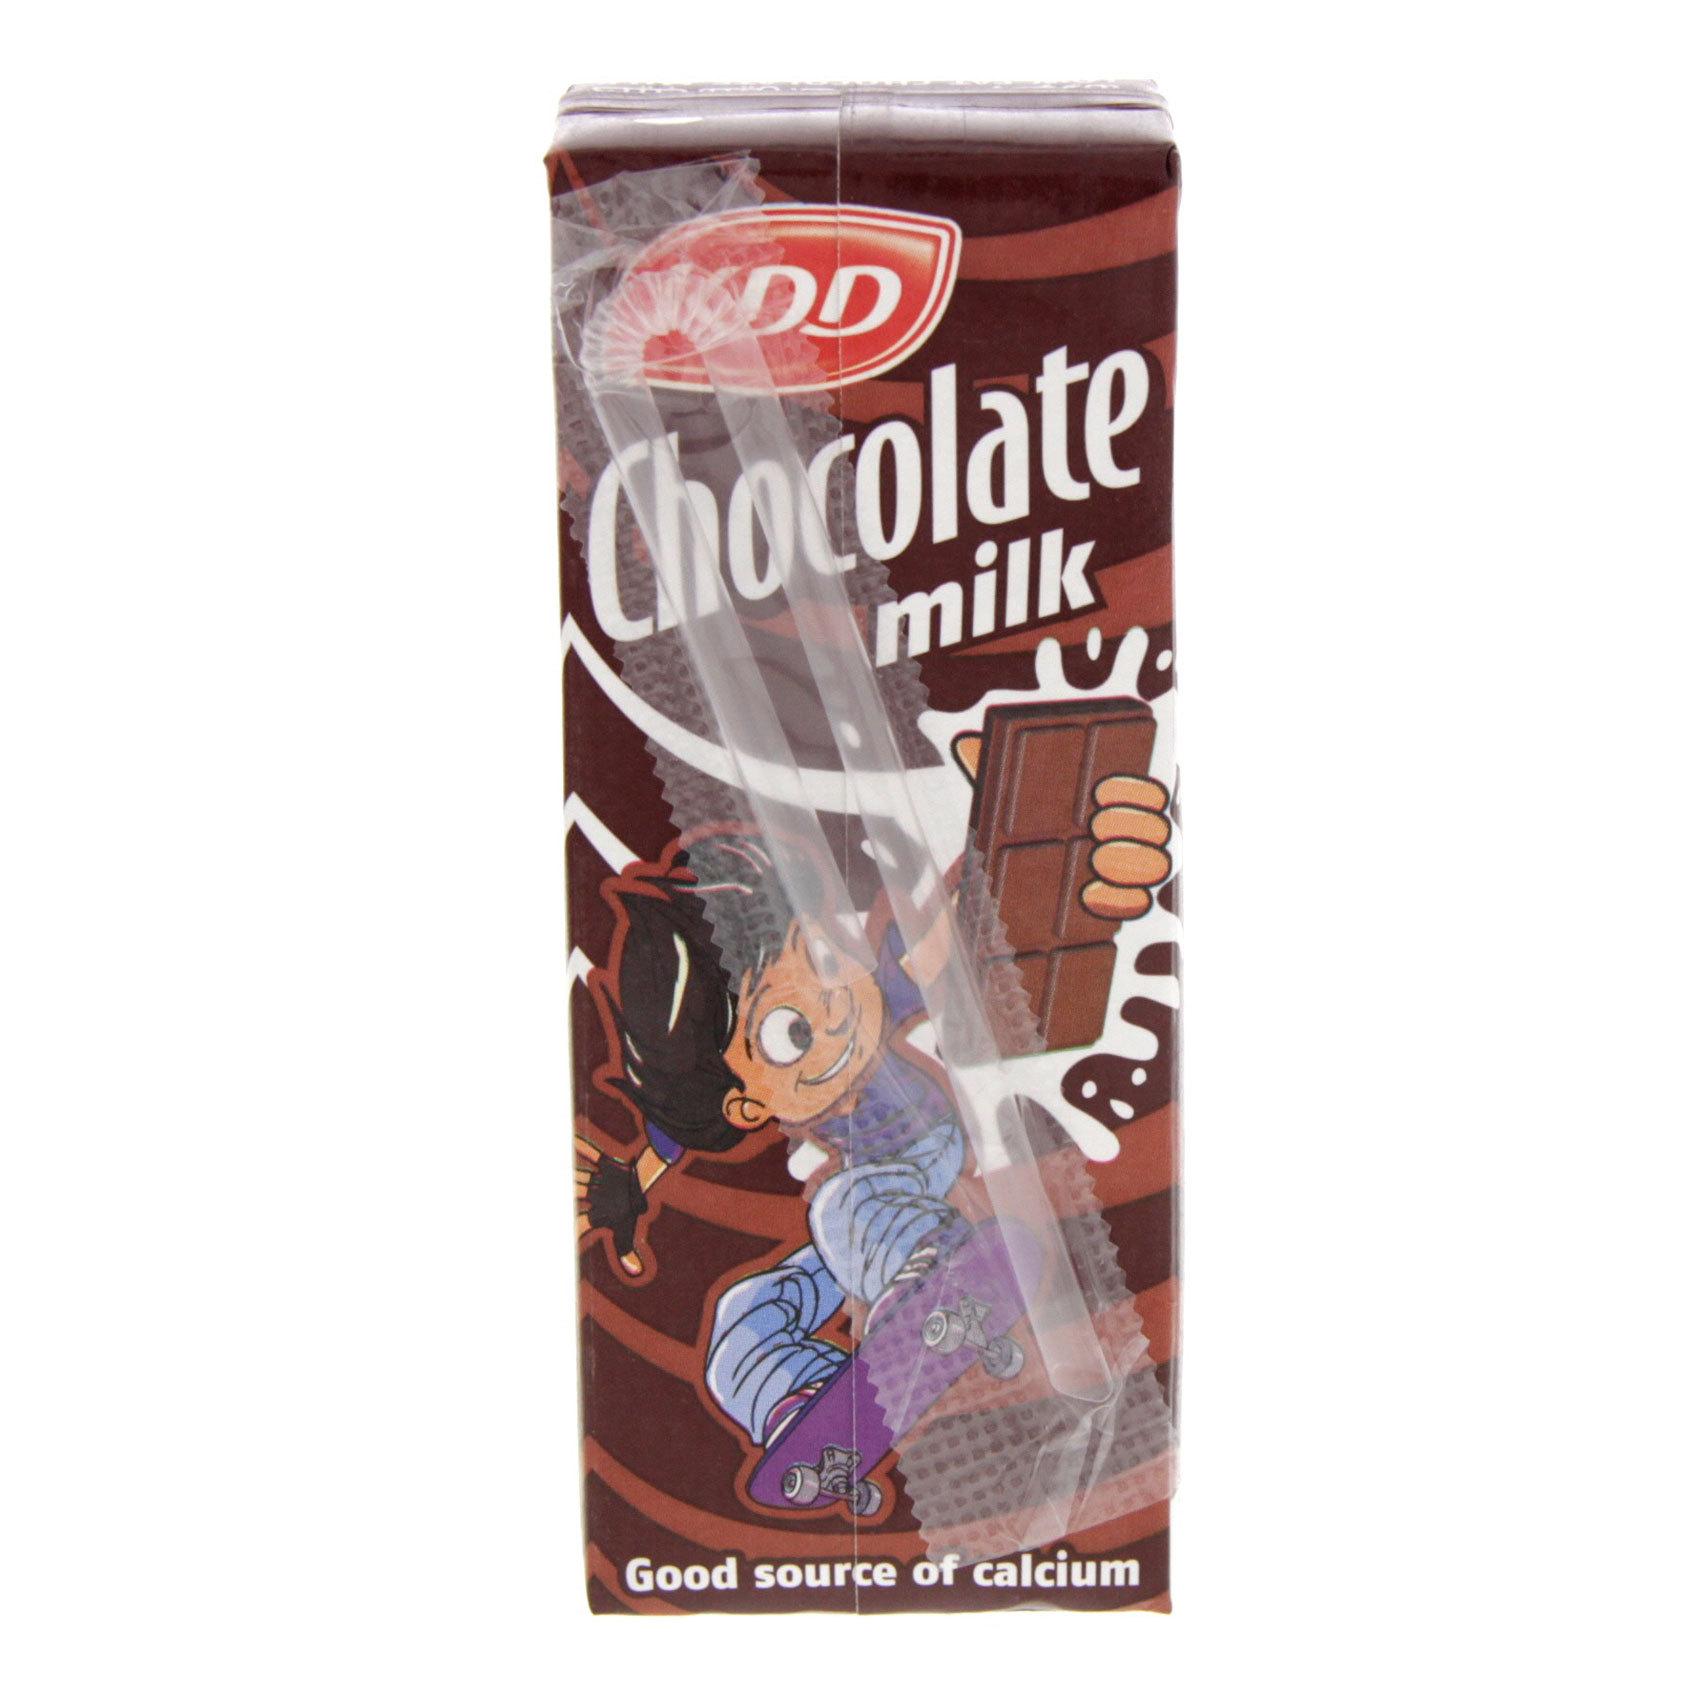 KDD UHT CHOCOLATE MILK 180ML.